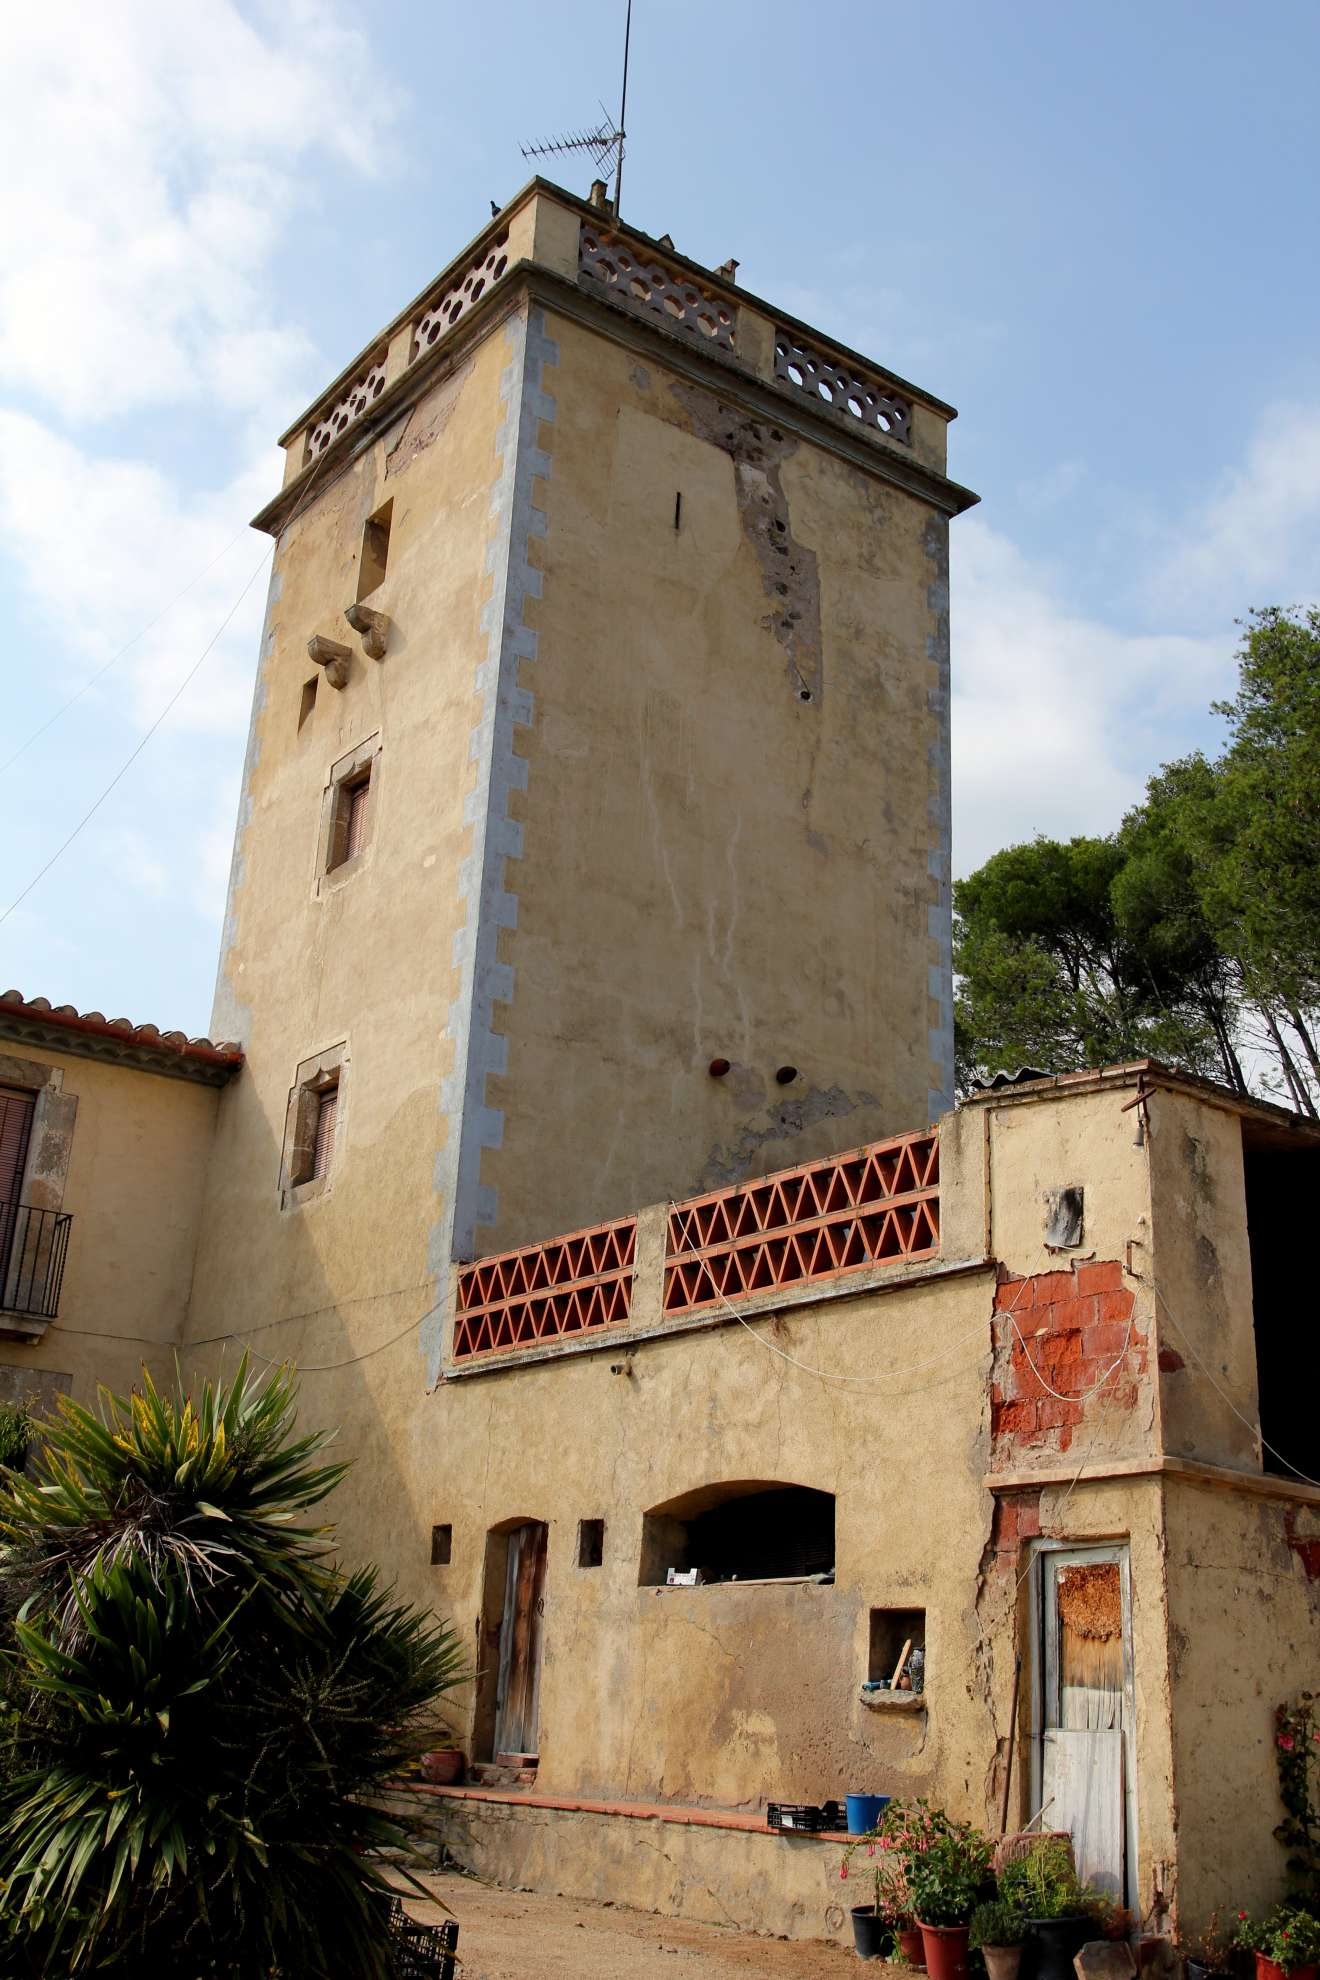 Torre Can Bonet D'Avall (240.73КБ)